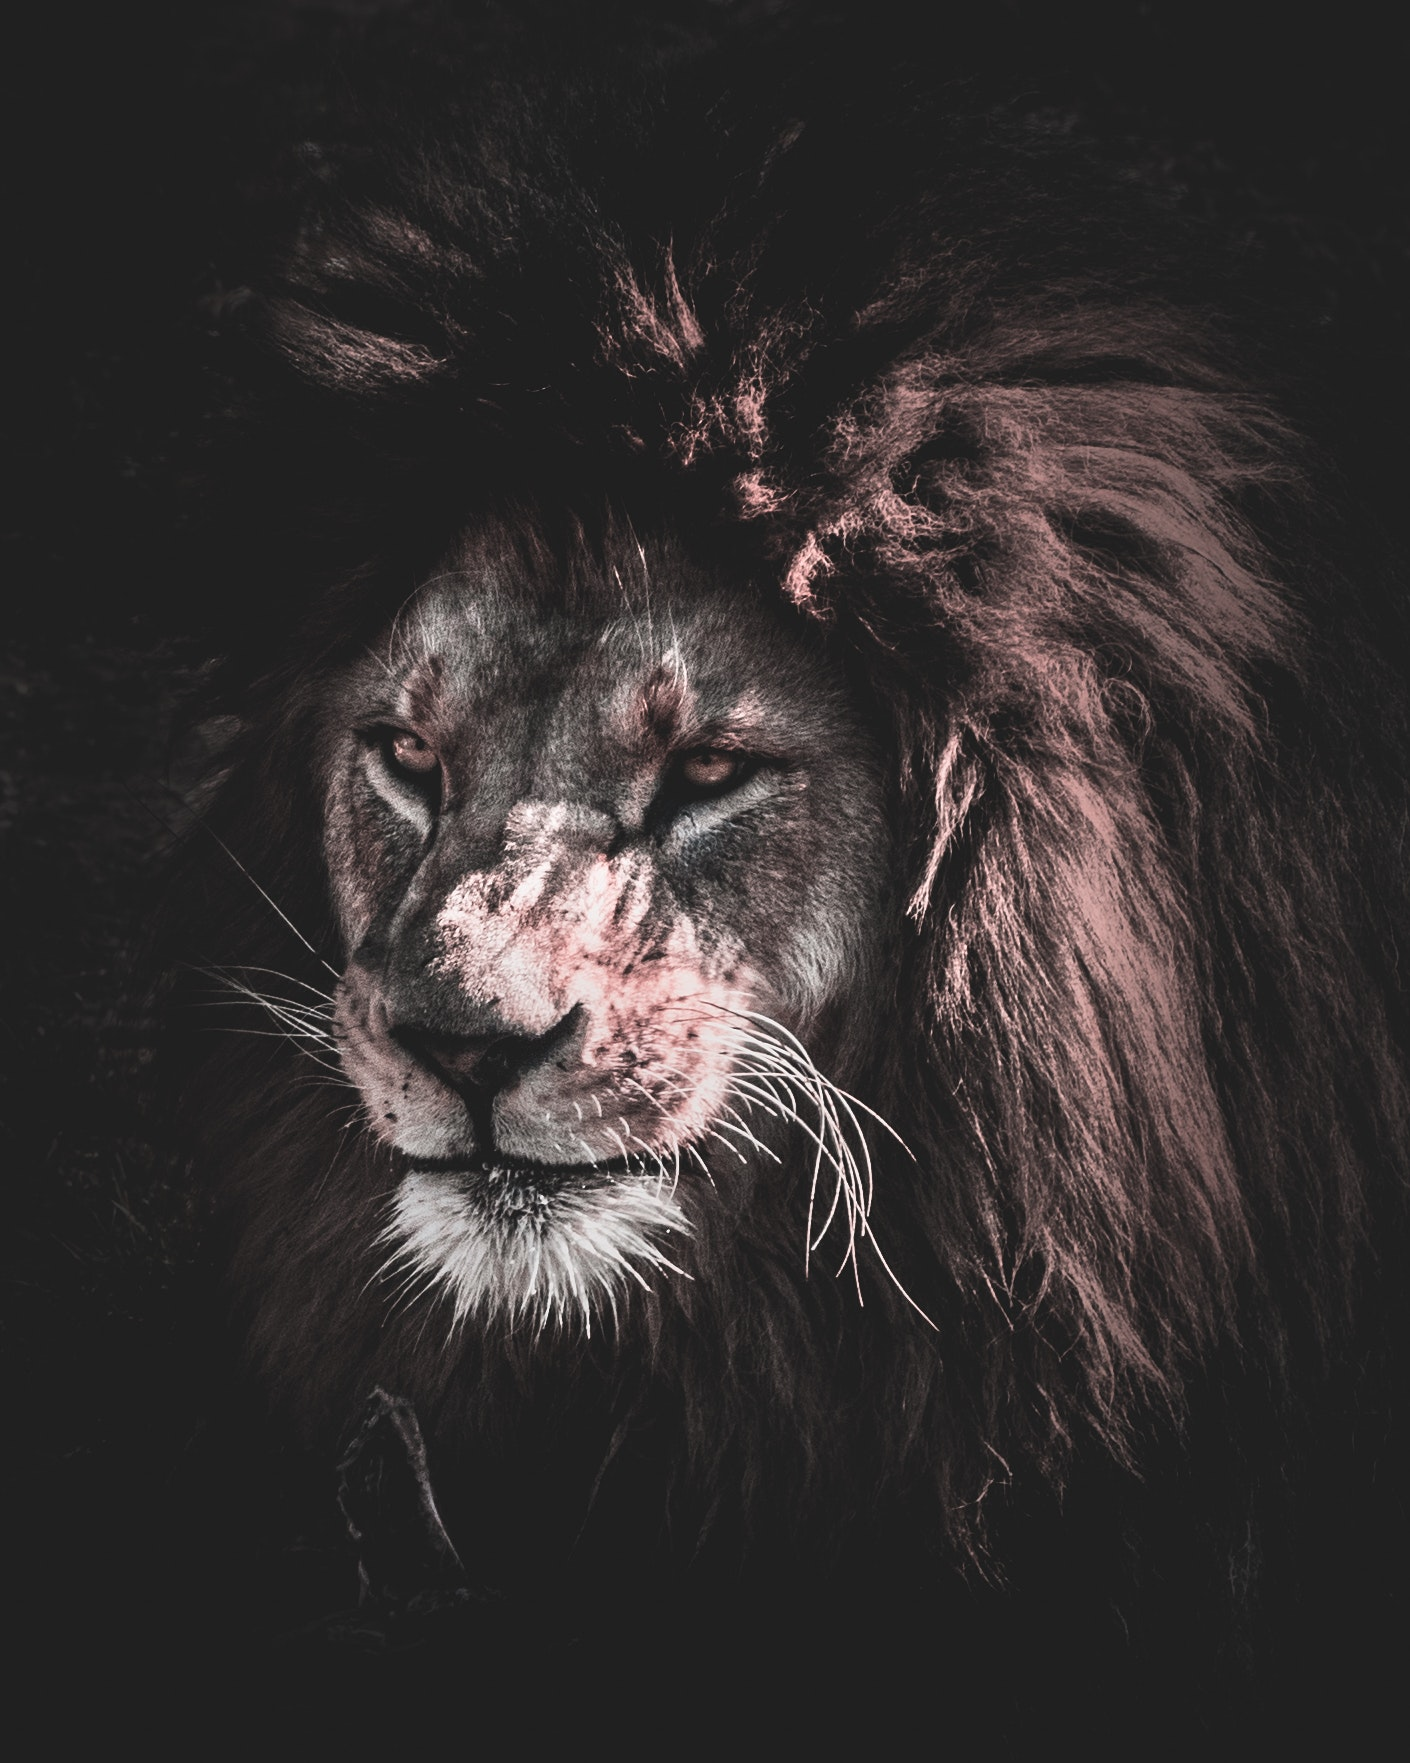 Lion Painting Free Stock Photo